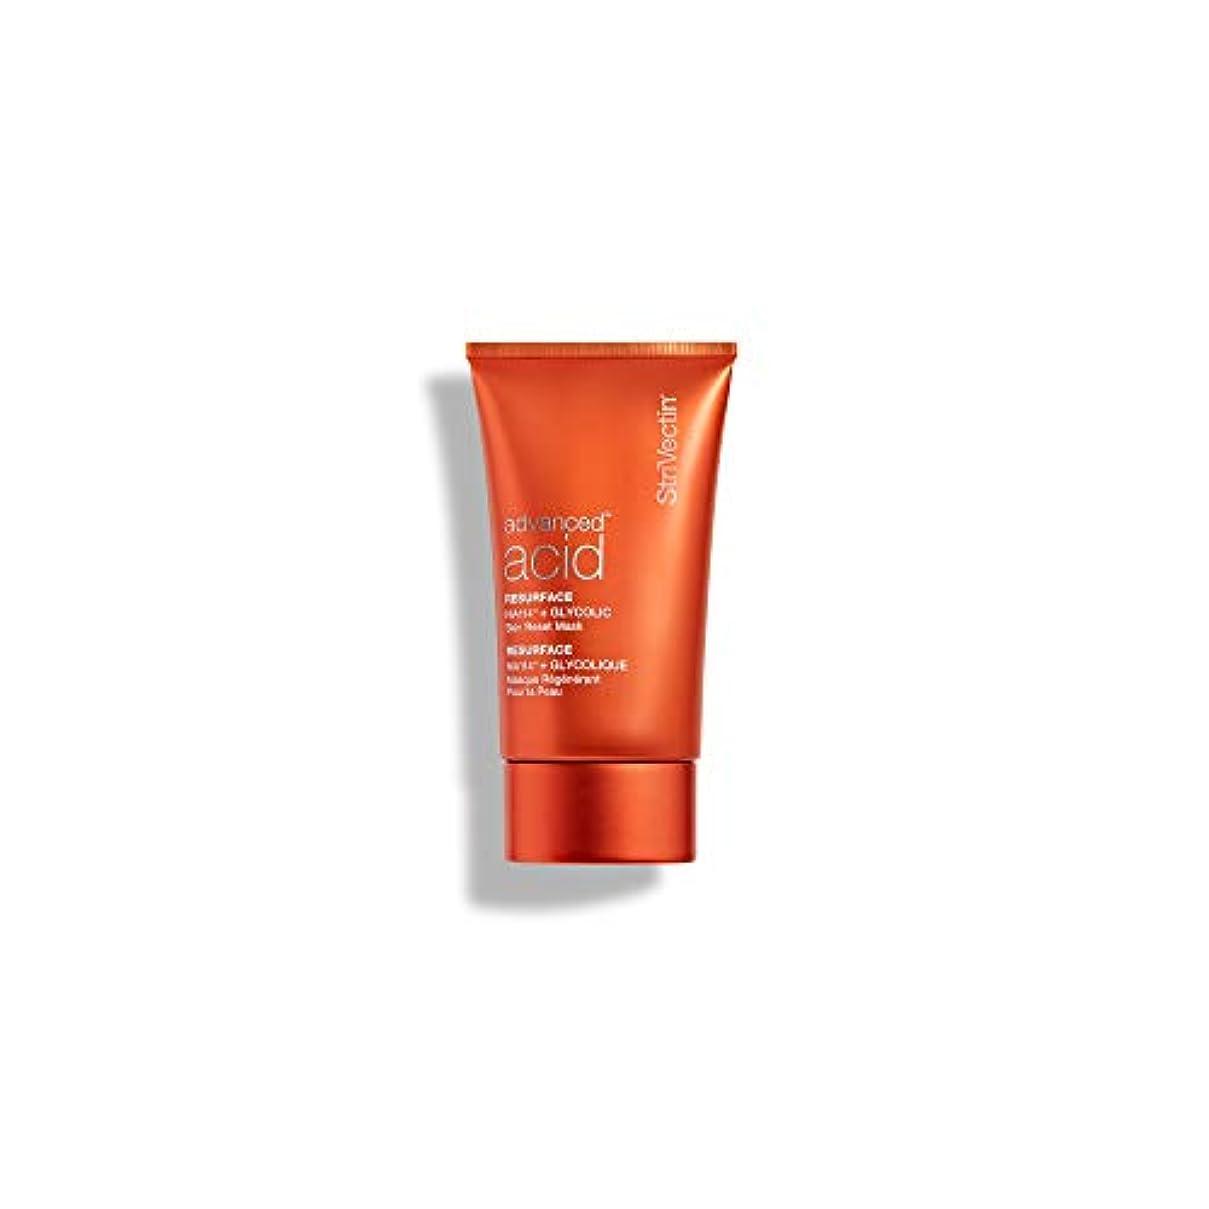 類人猿勇敢な倉庫Strivectin Advanced Resurfacing- Advanced Glycolic Acid Skin Reset Mask 1.7oz